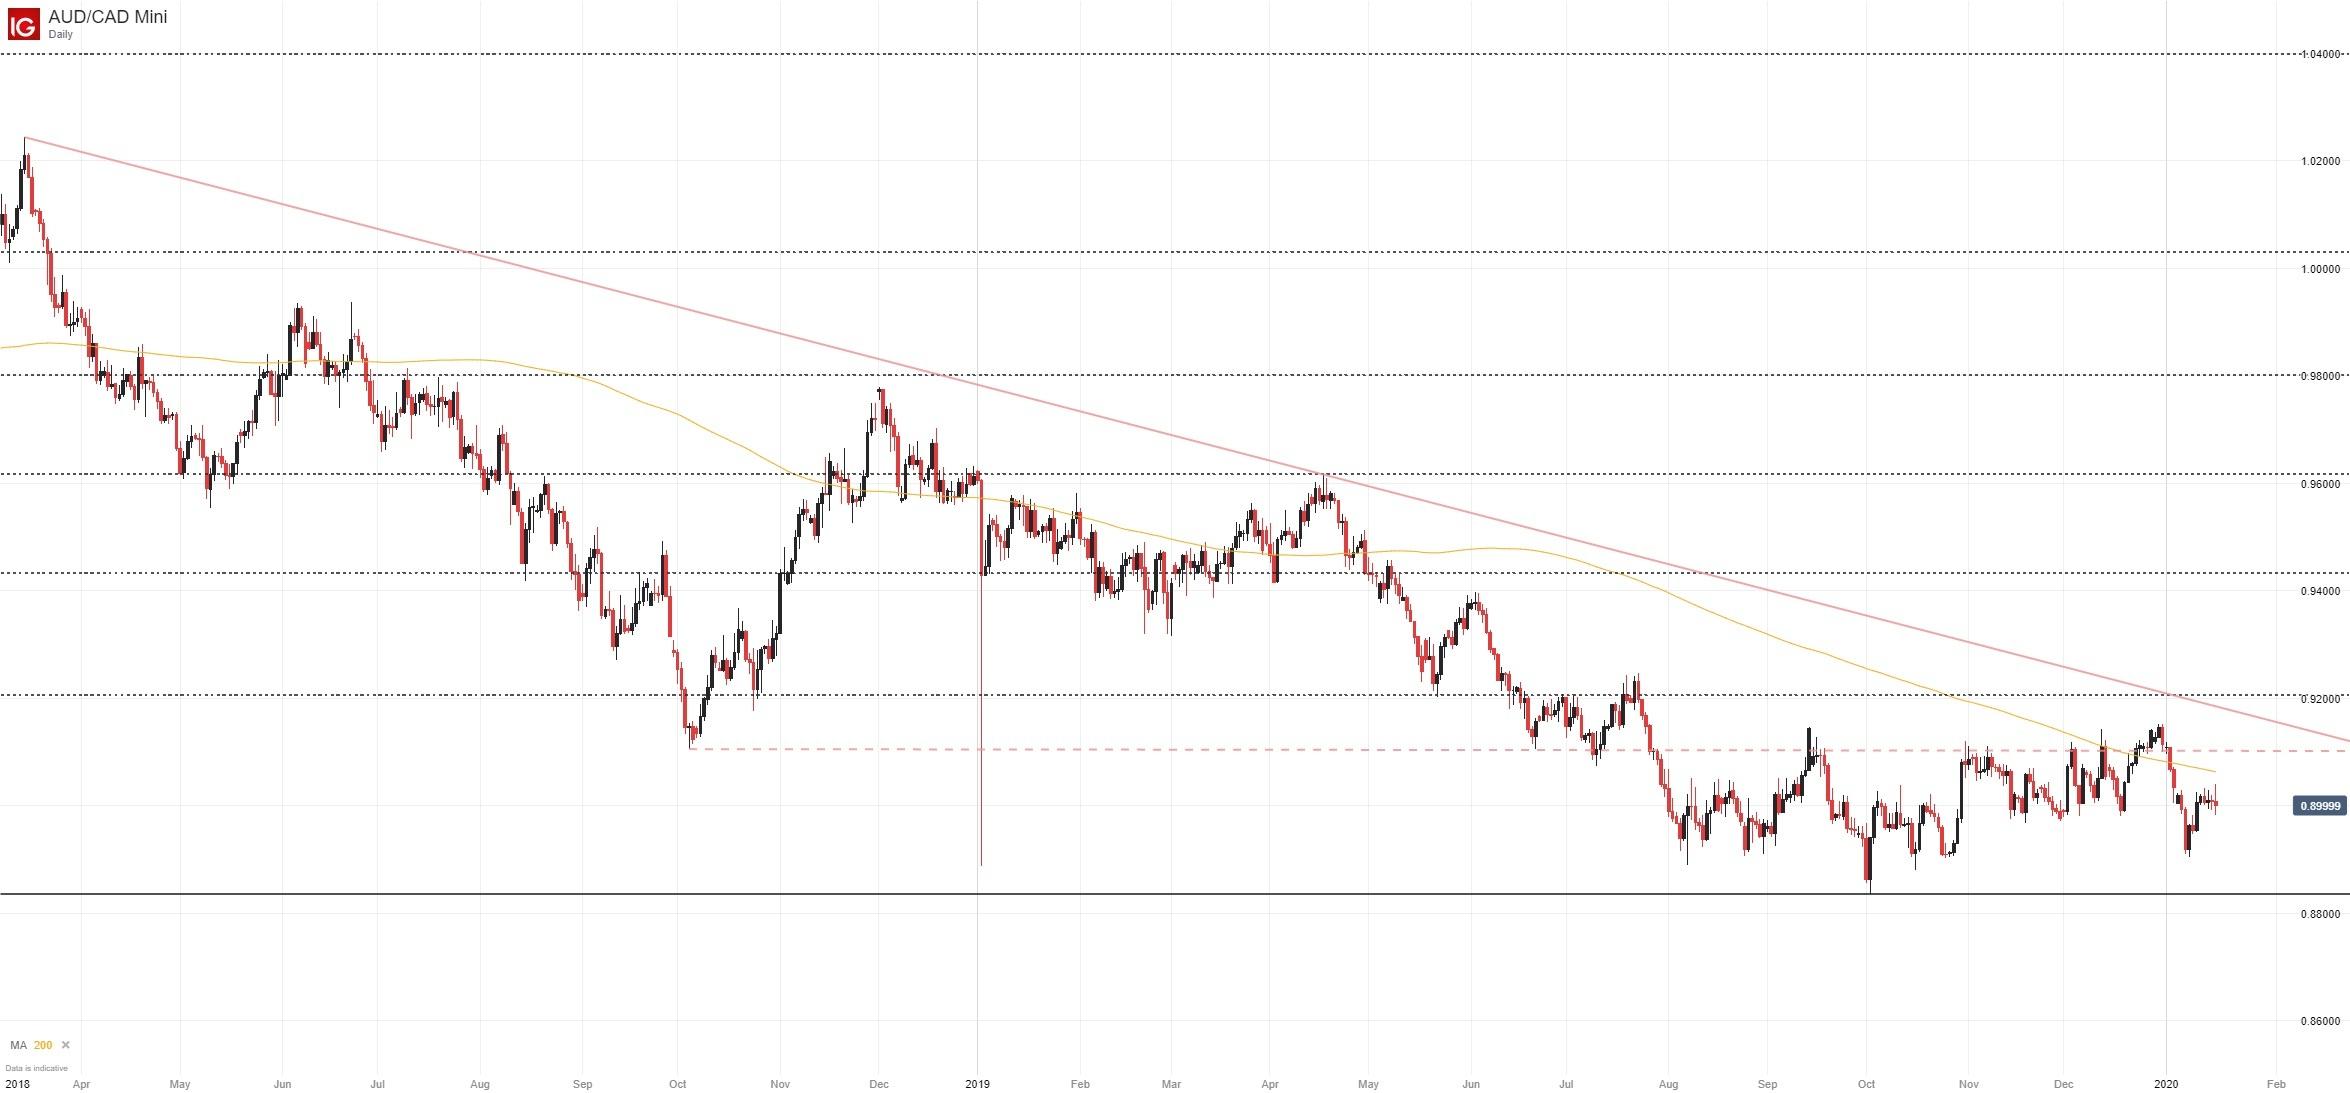 Australian Dollar (AUD) Outlook: AUD/USD, AUD/CAD, AUD/NZD - Stocks Hours